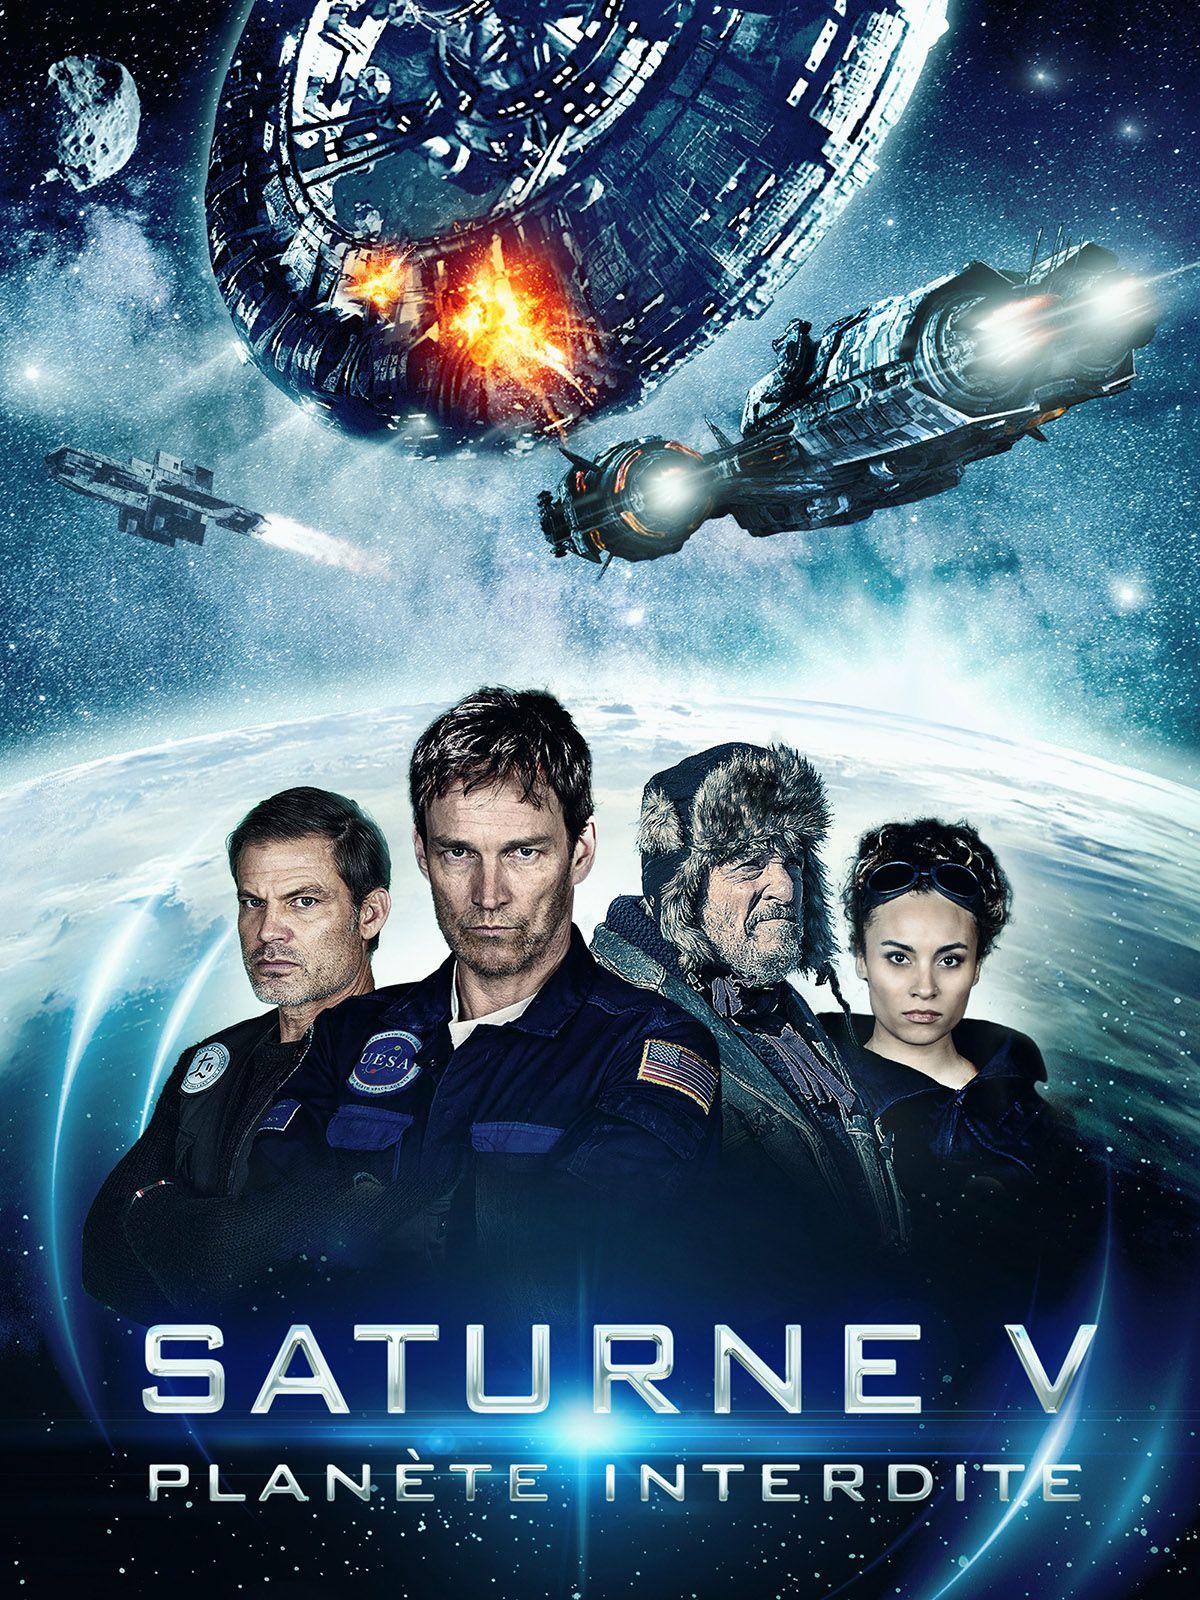 Saturne V, planète interdite - Film (2021)